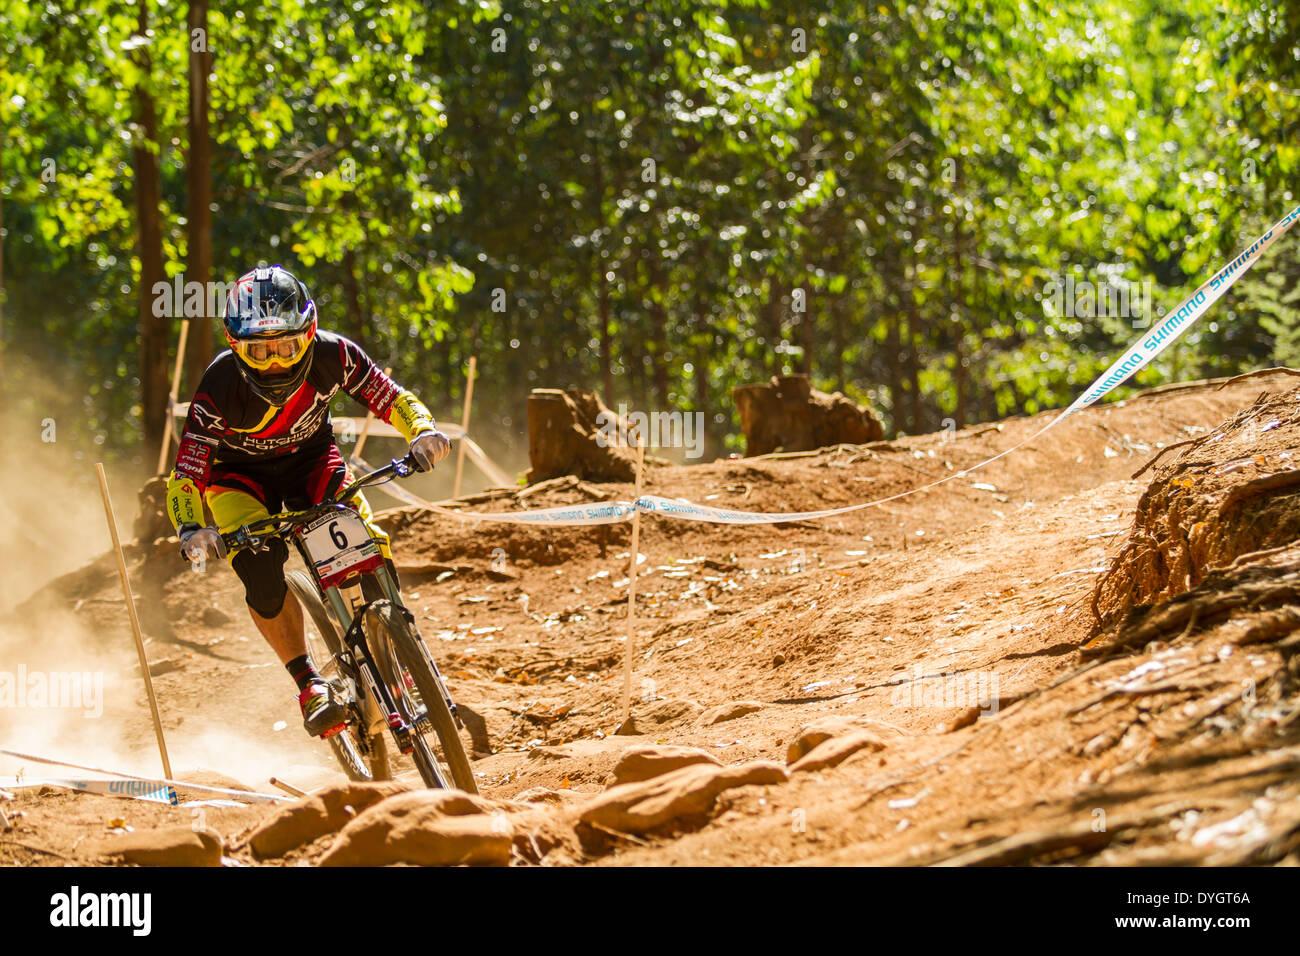 Cornering on downhill track - Stock Image